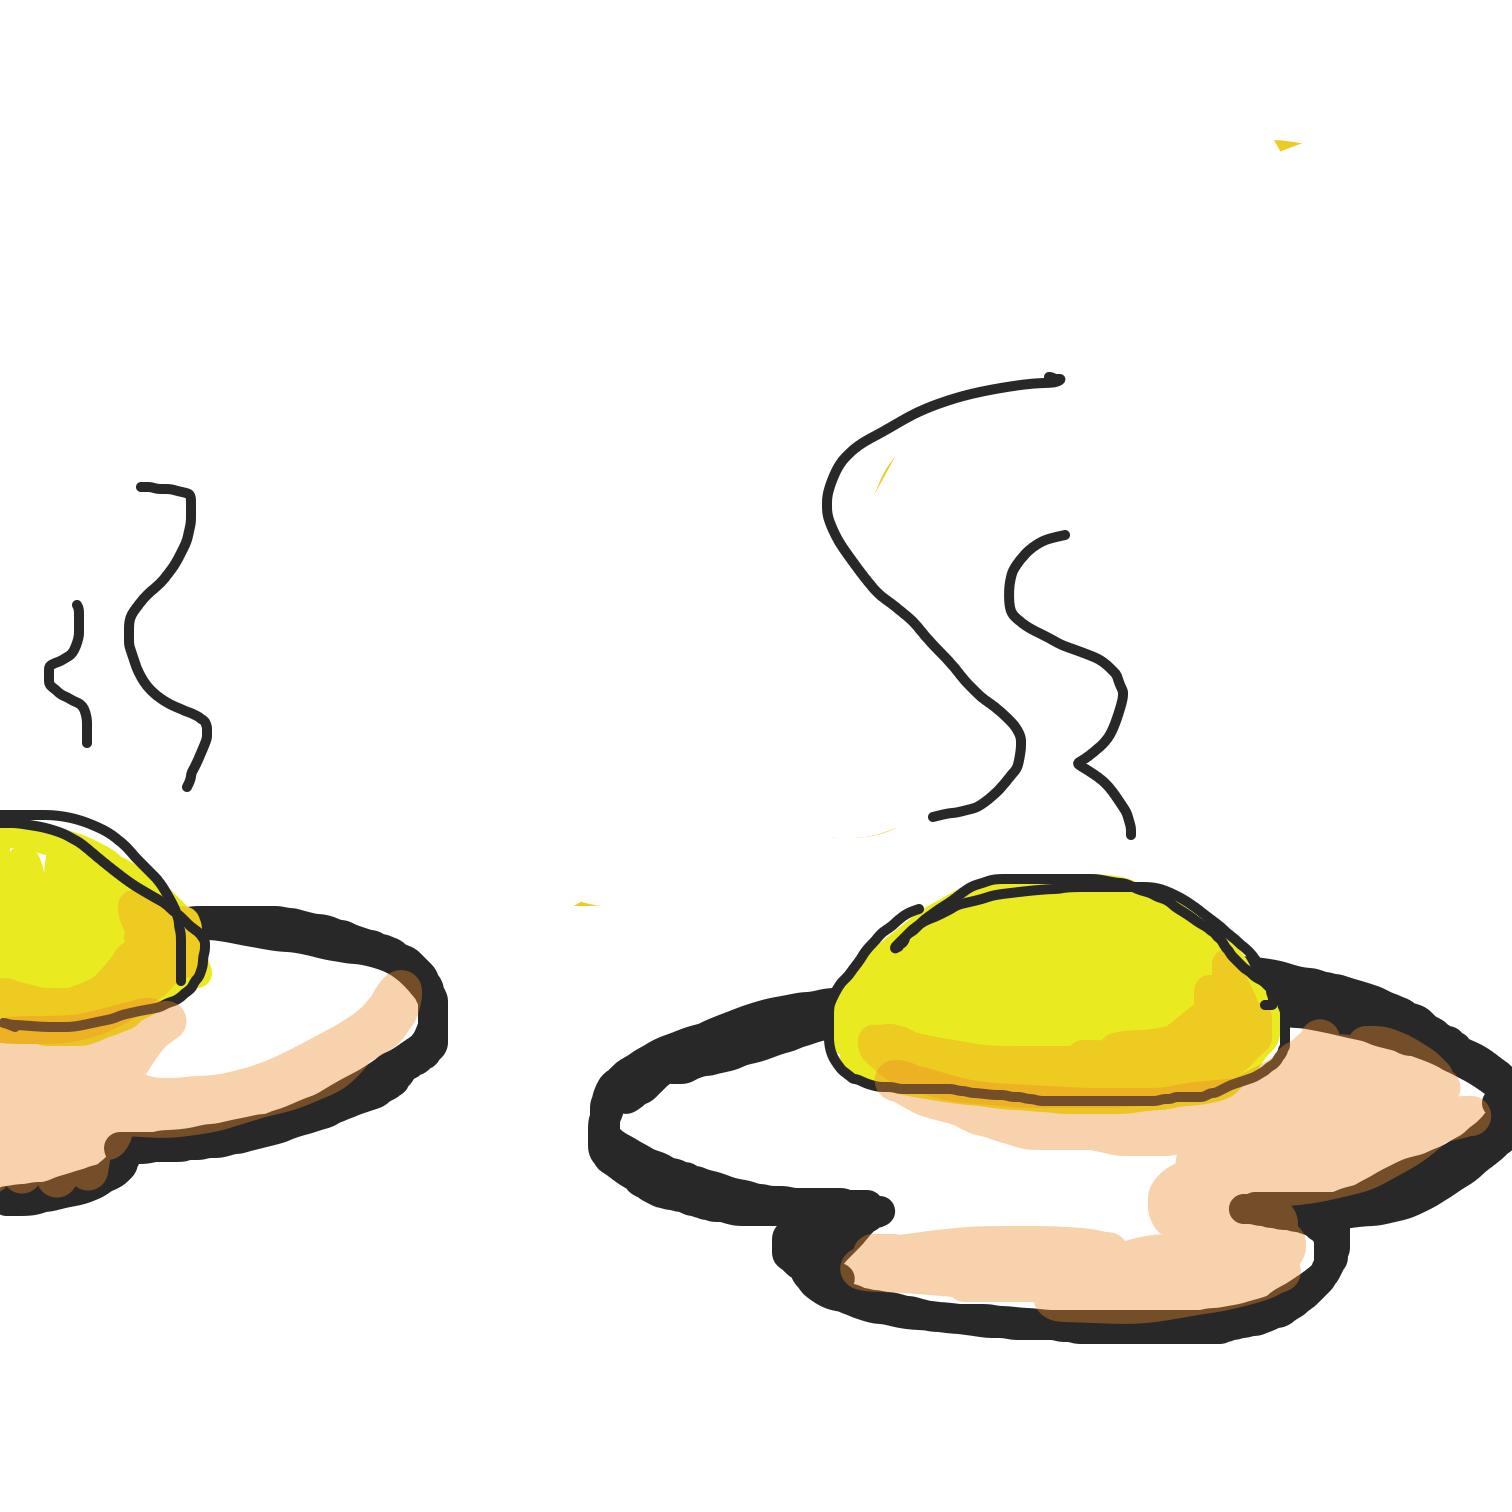 Drawing in Eggs by Juleefish